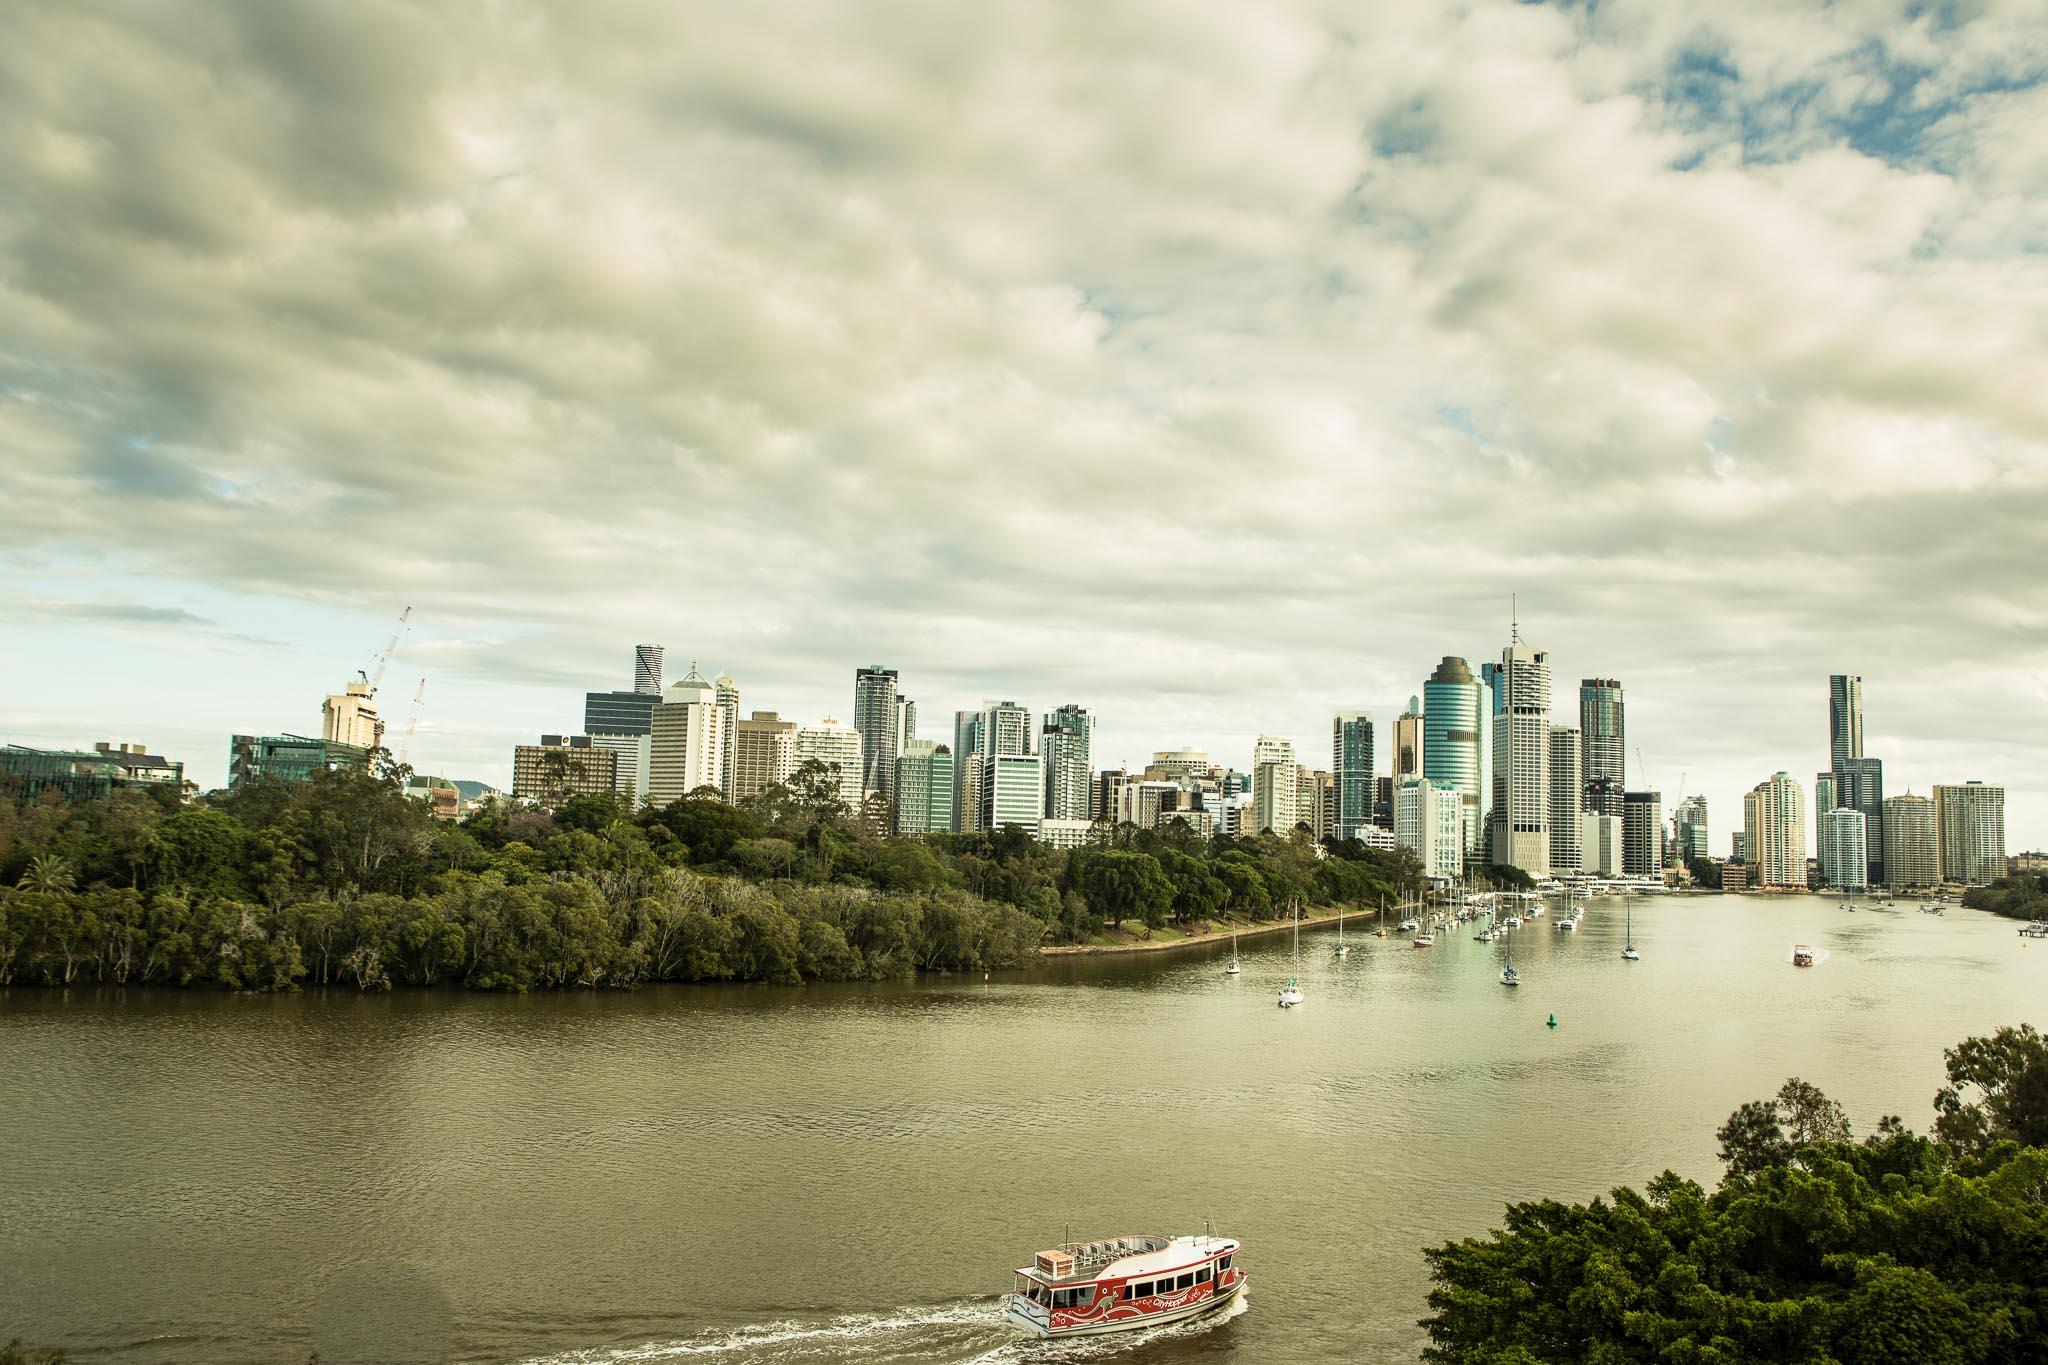 Brisbane Day Photography Workshop